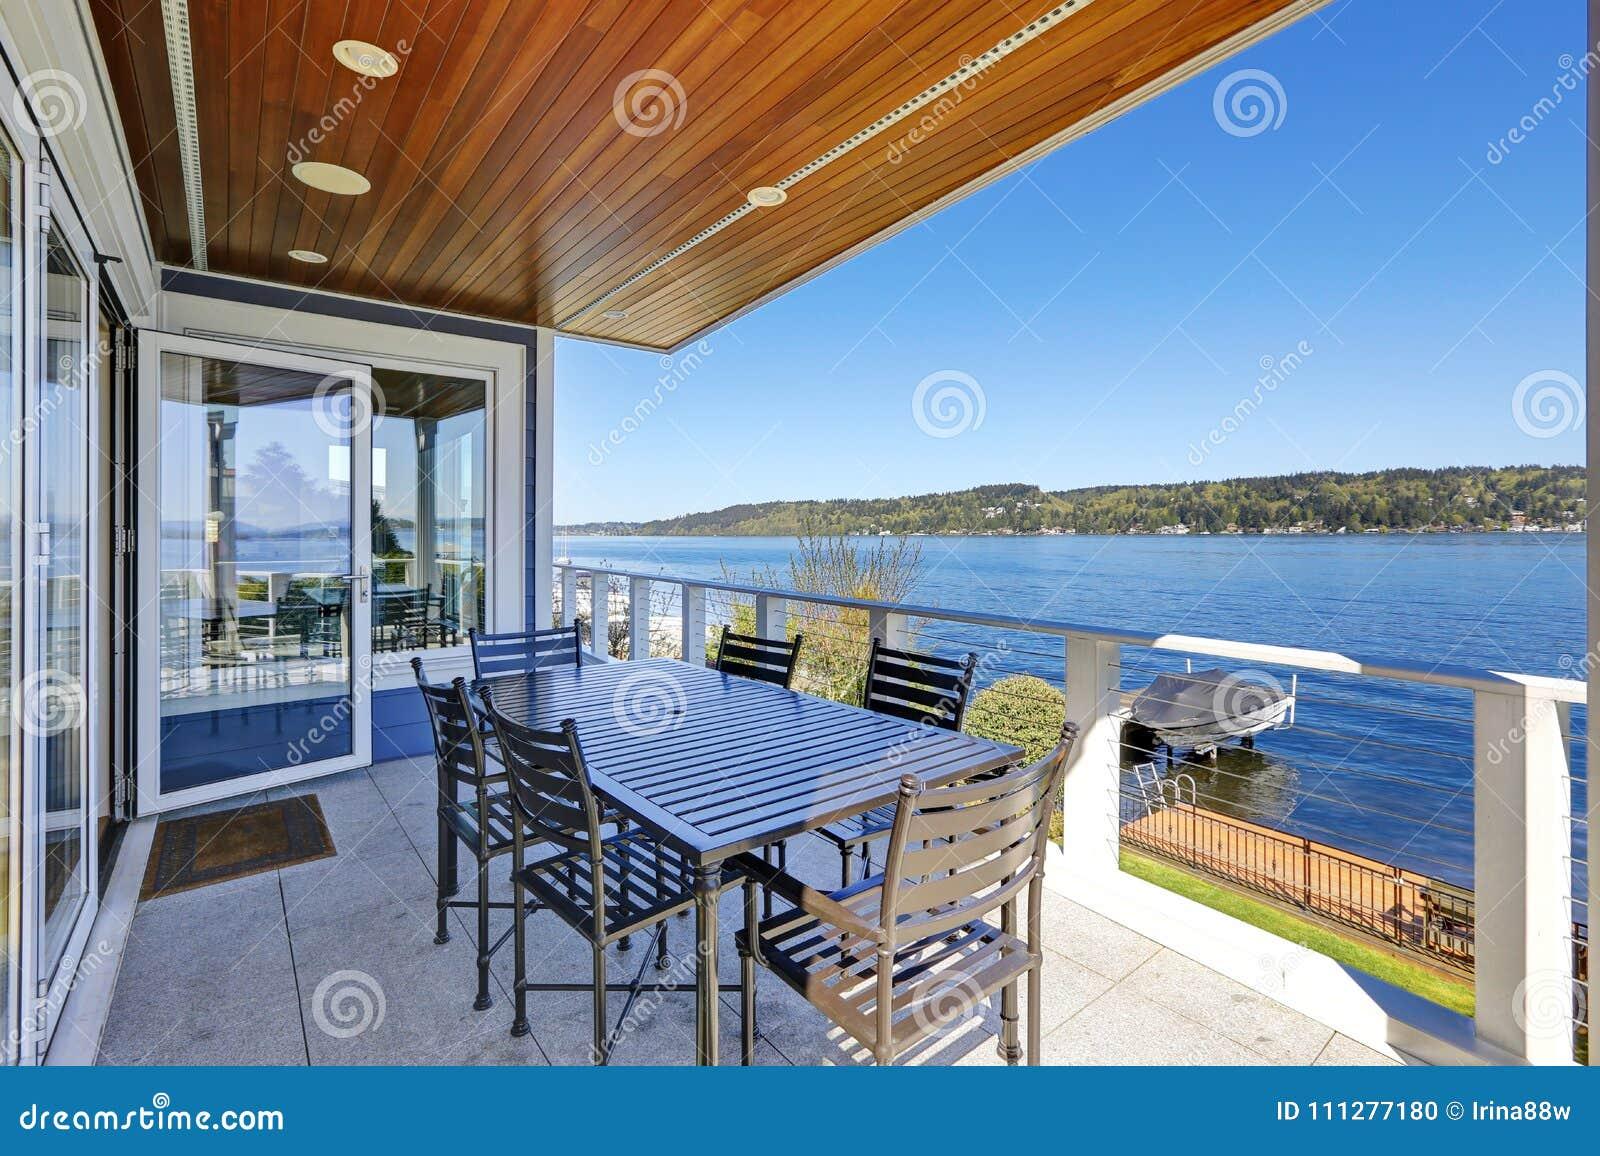 outdoor terrace lighting. Royalty-Free Stock Photo Outdoor Terrace Lighting